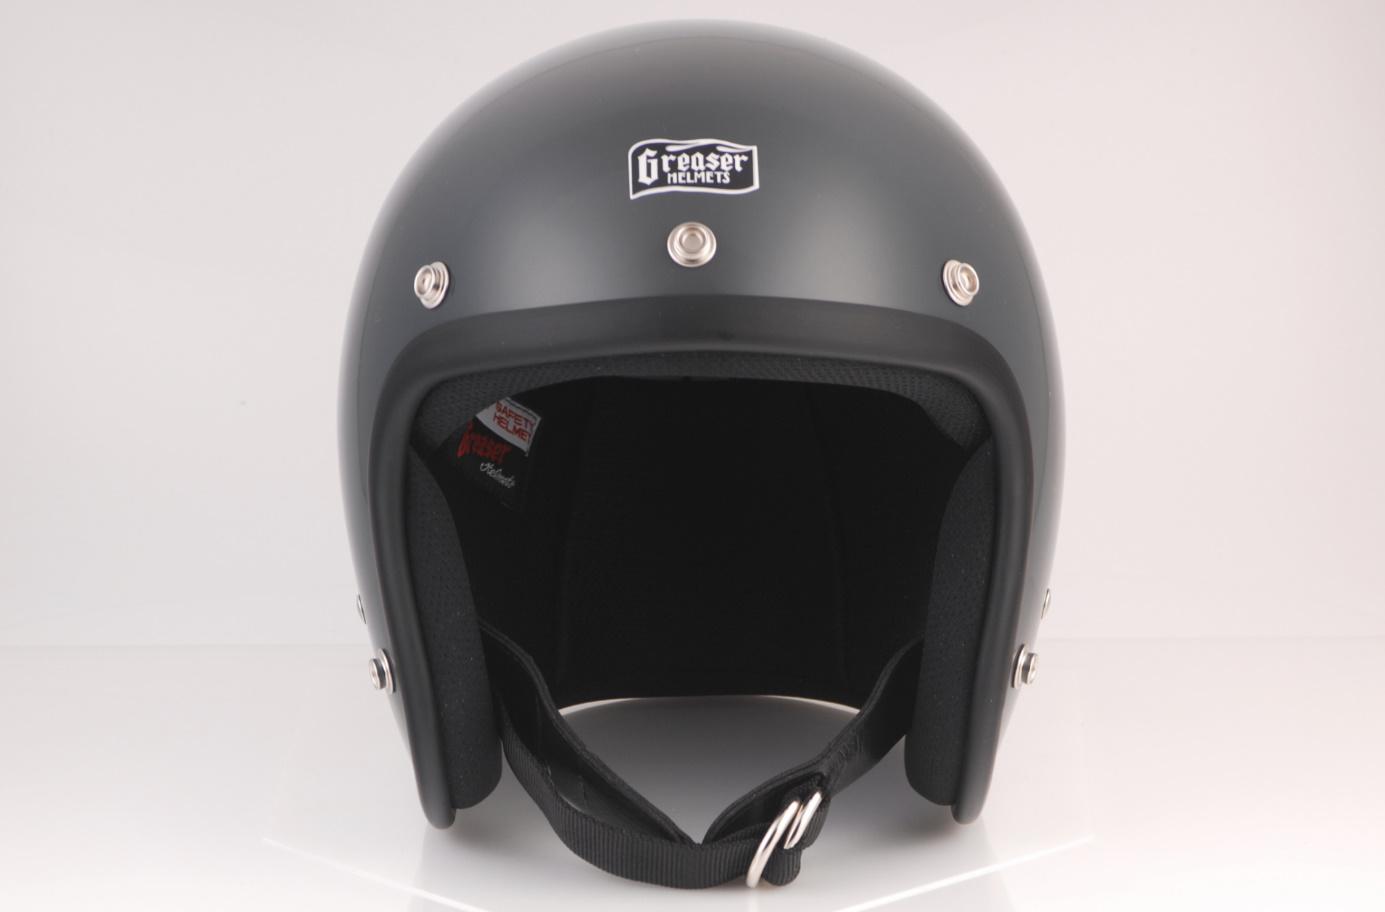 GREASER 60's PLAIN ジェットヘルメット ガンシップグレー L(59cm~60cm) GREASER(グリーサー)